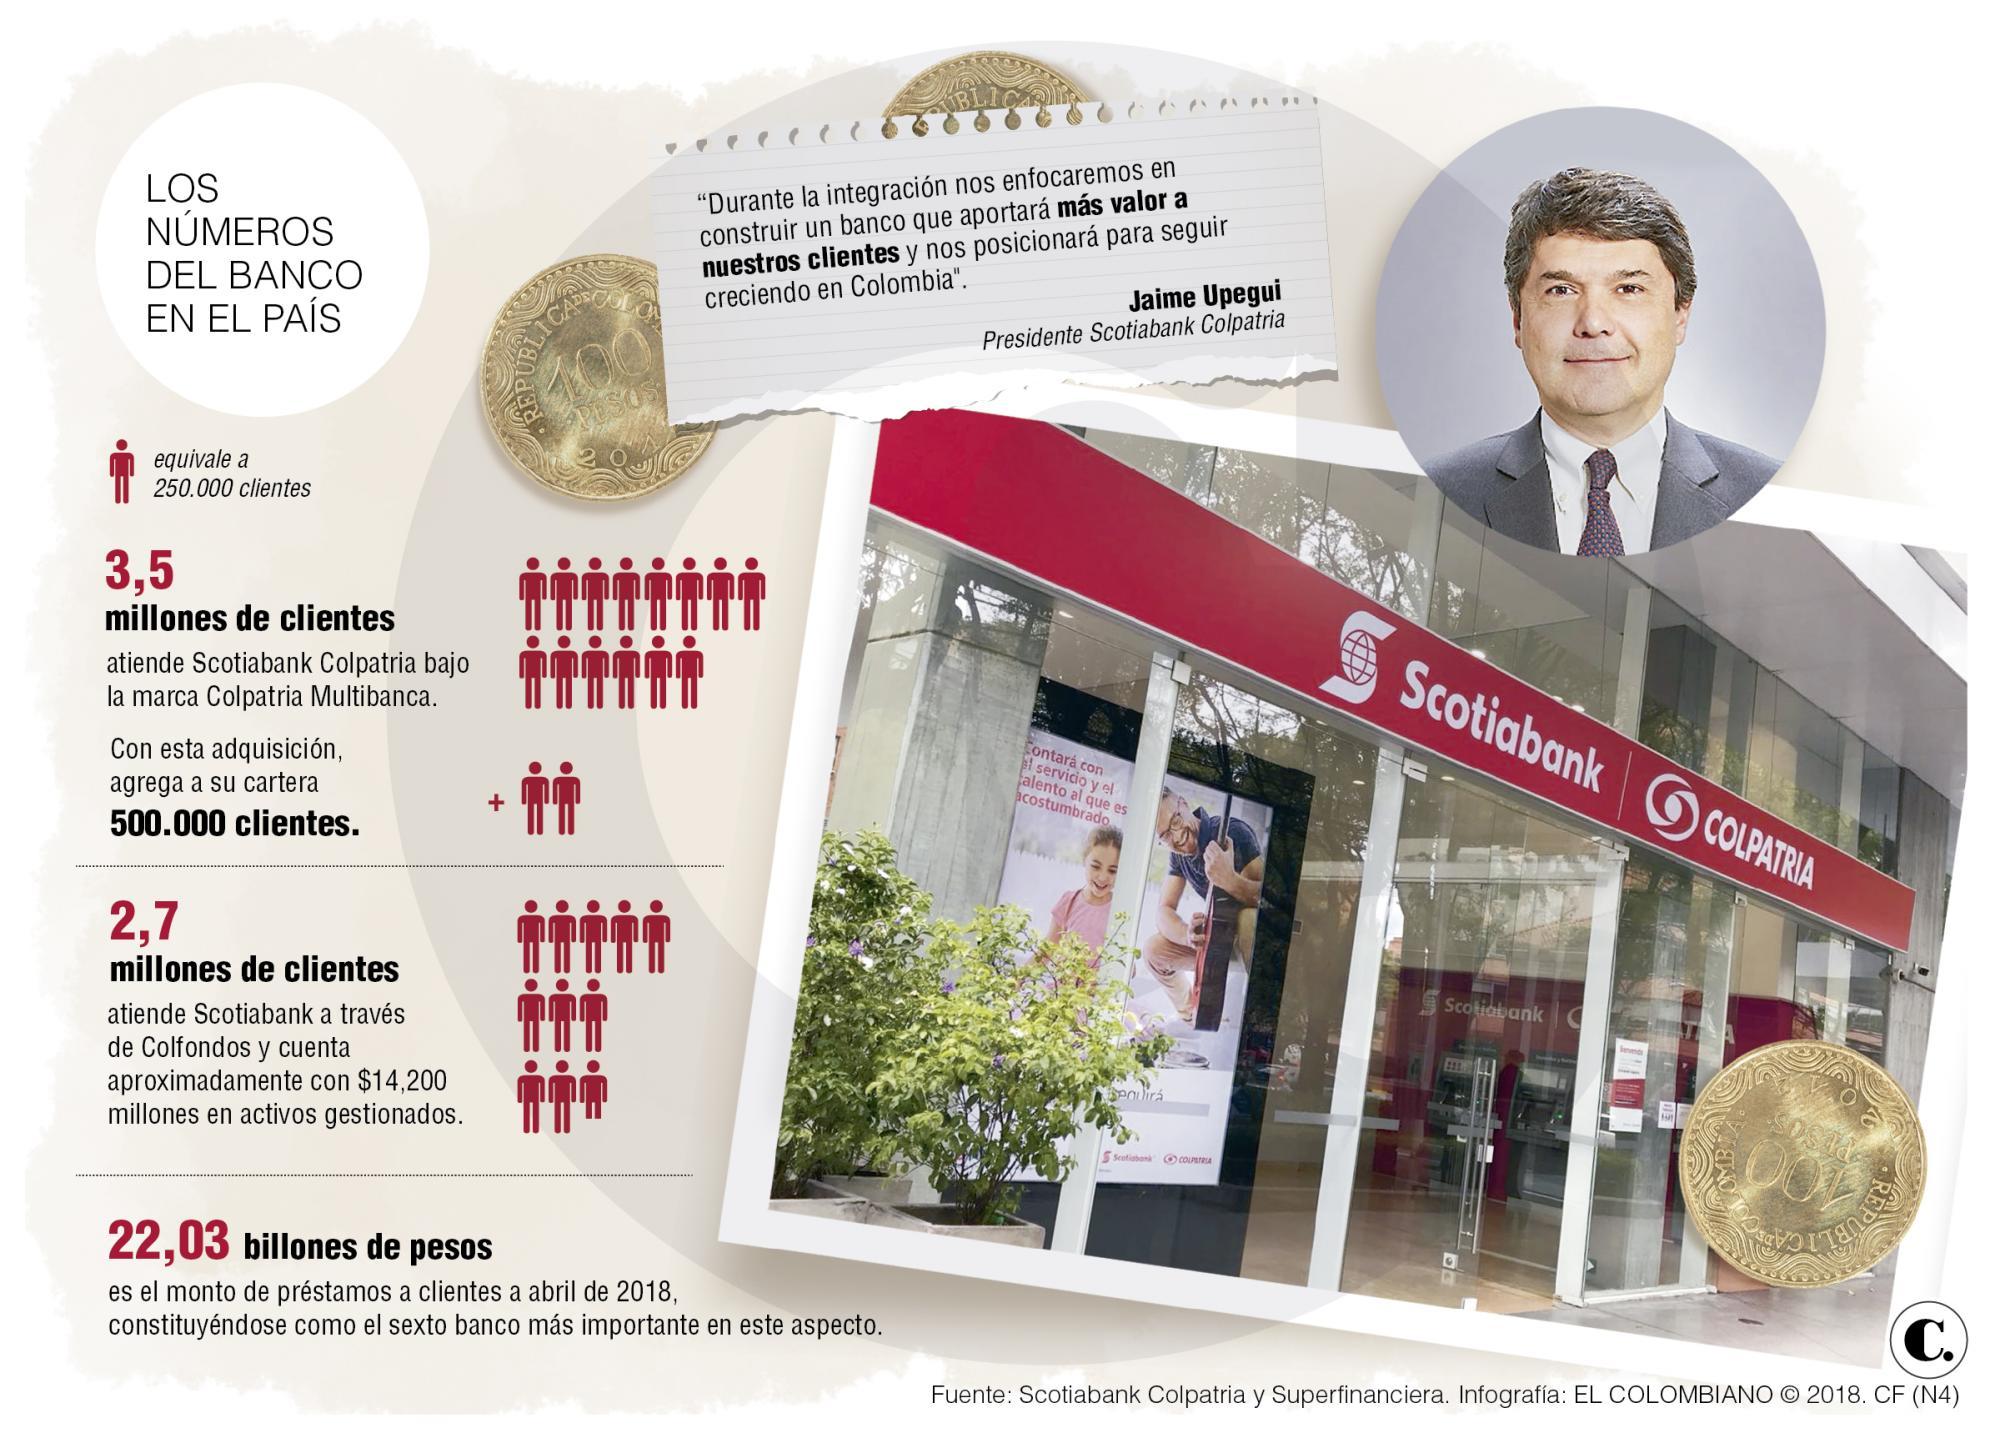 Scotiabank Colpatria suma 500 mil clientes tras adquirir operaciones de Citi